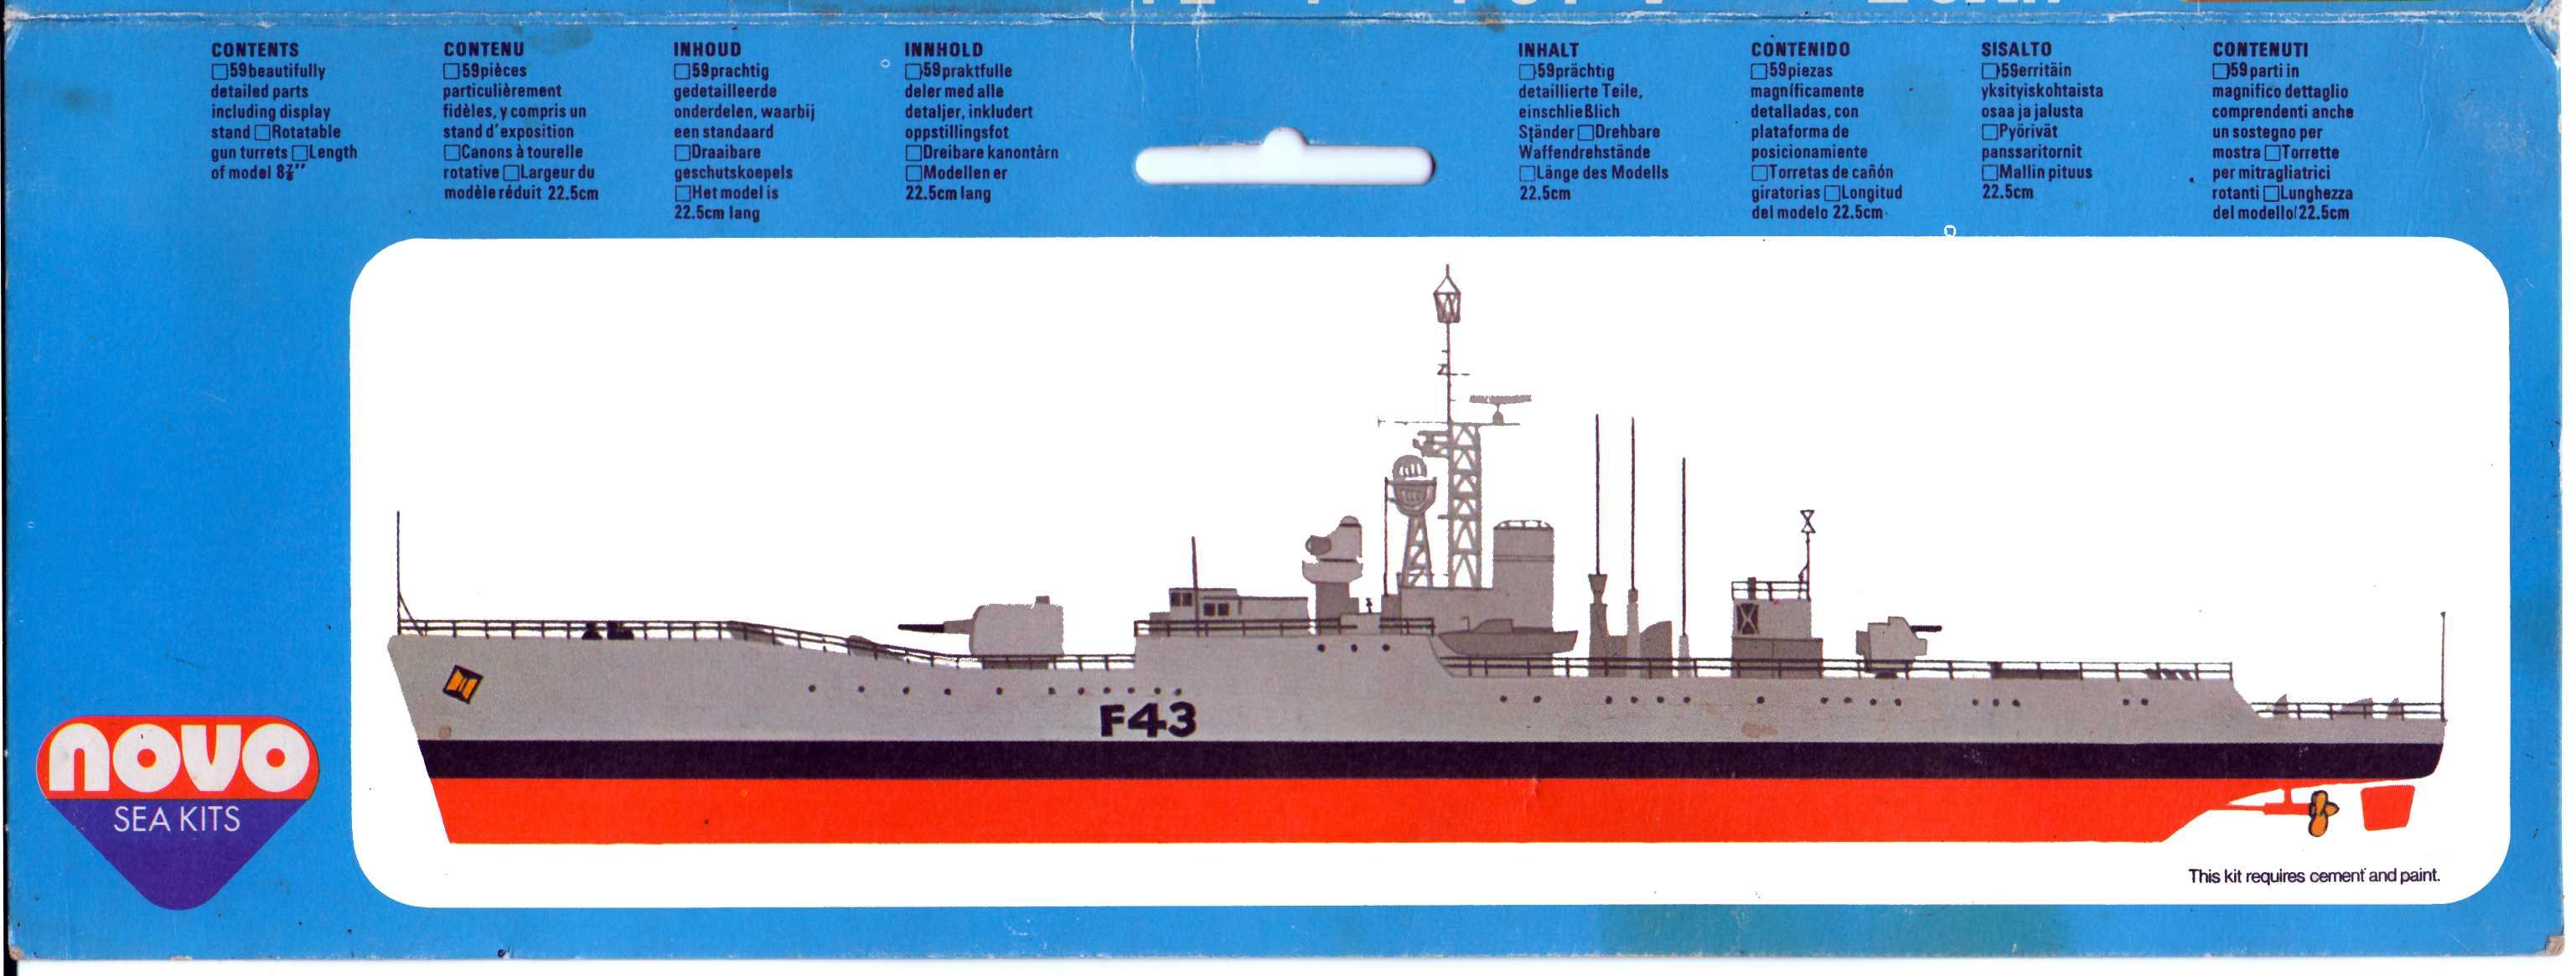 Гид по окраске и нанесению маркировки NOVO Toys Ltd F125 Cat.No.76030 HMS Torquay Anti-Submarine Frigate